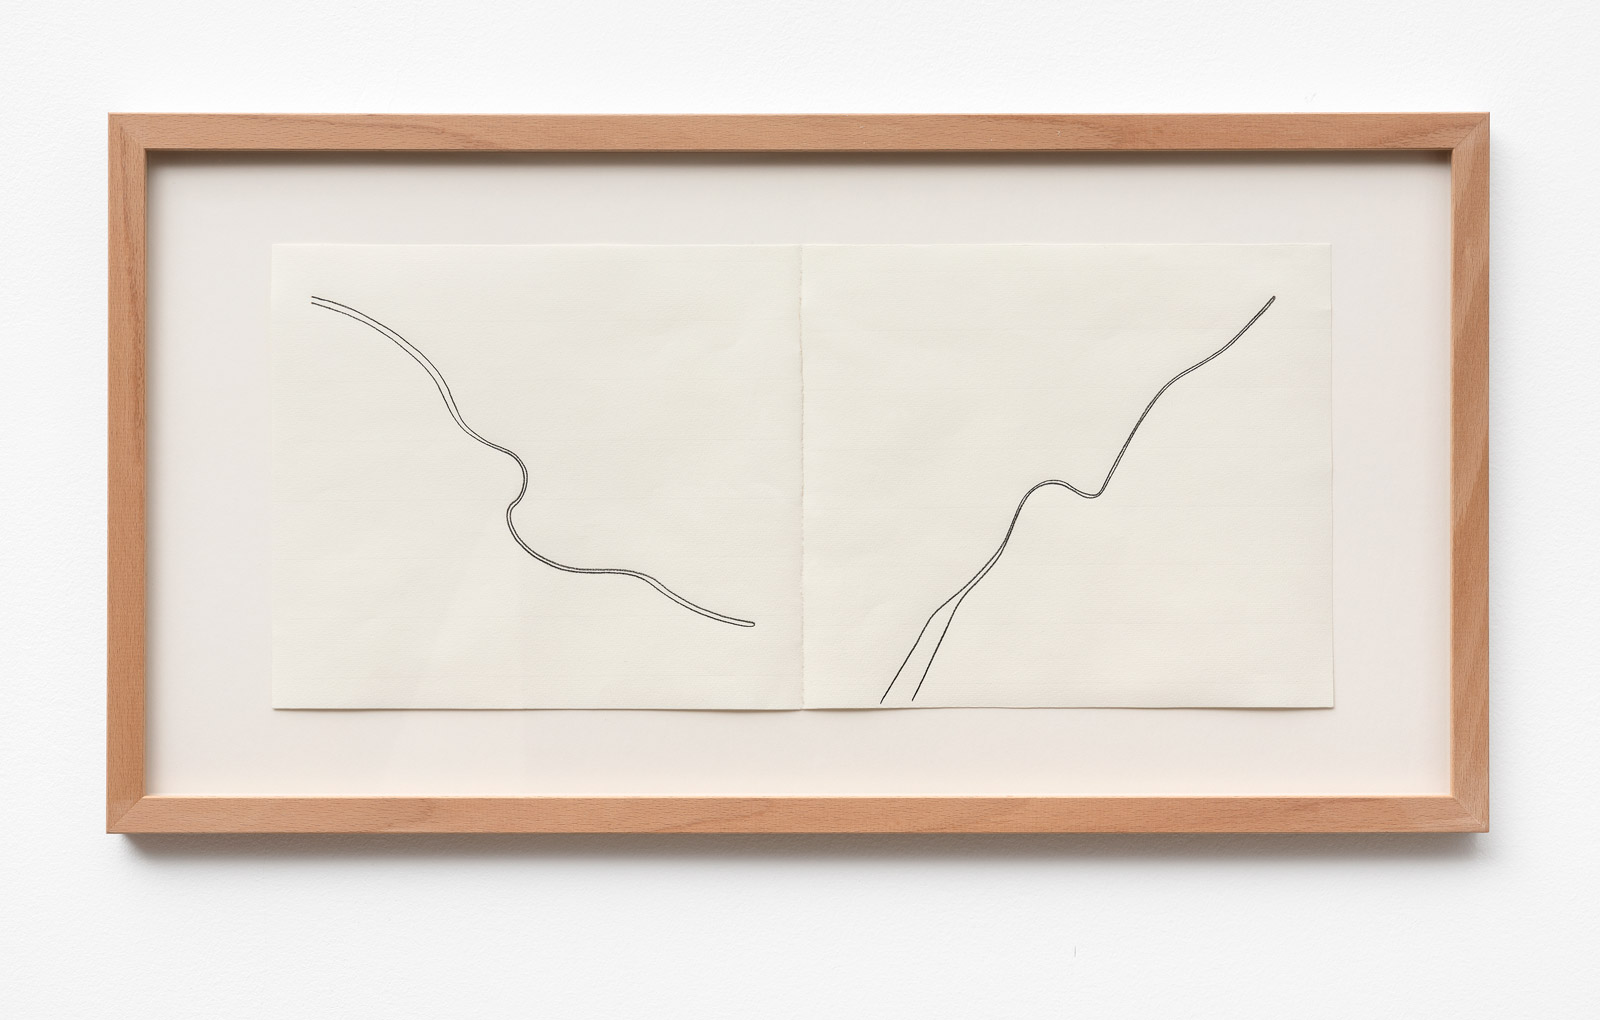 Christian Hanussek Double Feature 2 2019 pencil on paper 21 x 48 cm 33 x 625 cm framed